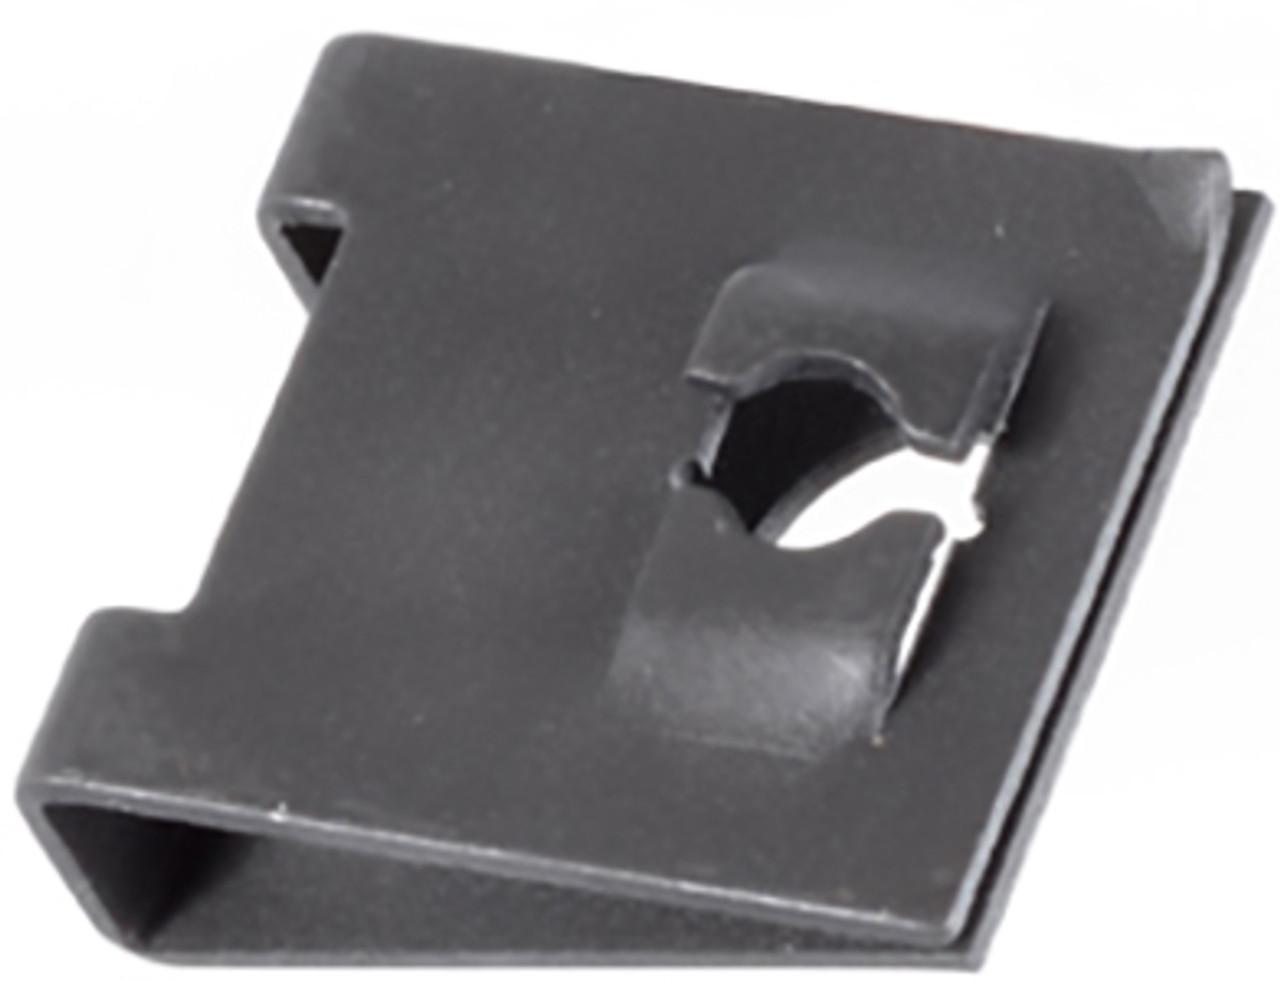 "#8 Screw Panel Range: .094 - .156"" Center Of Hole To Edge: 1/2"" OEM # N803183-S32 25 Per Box"